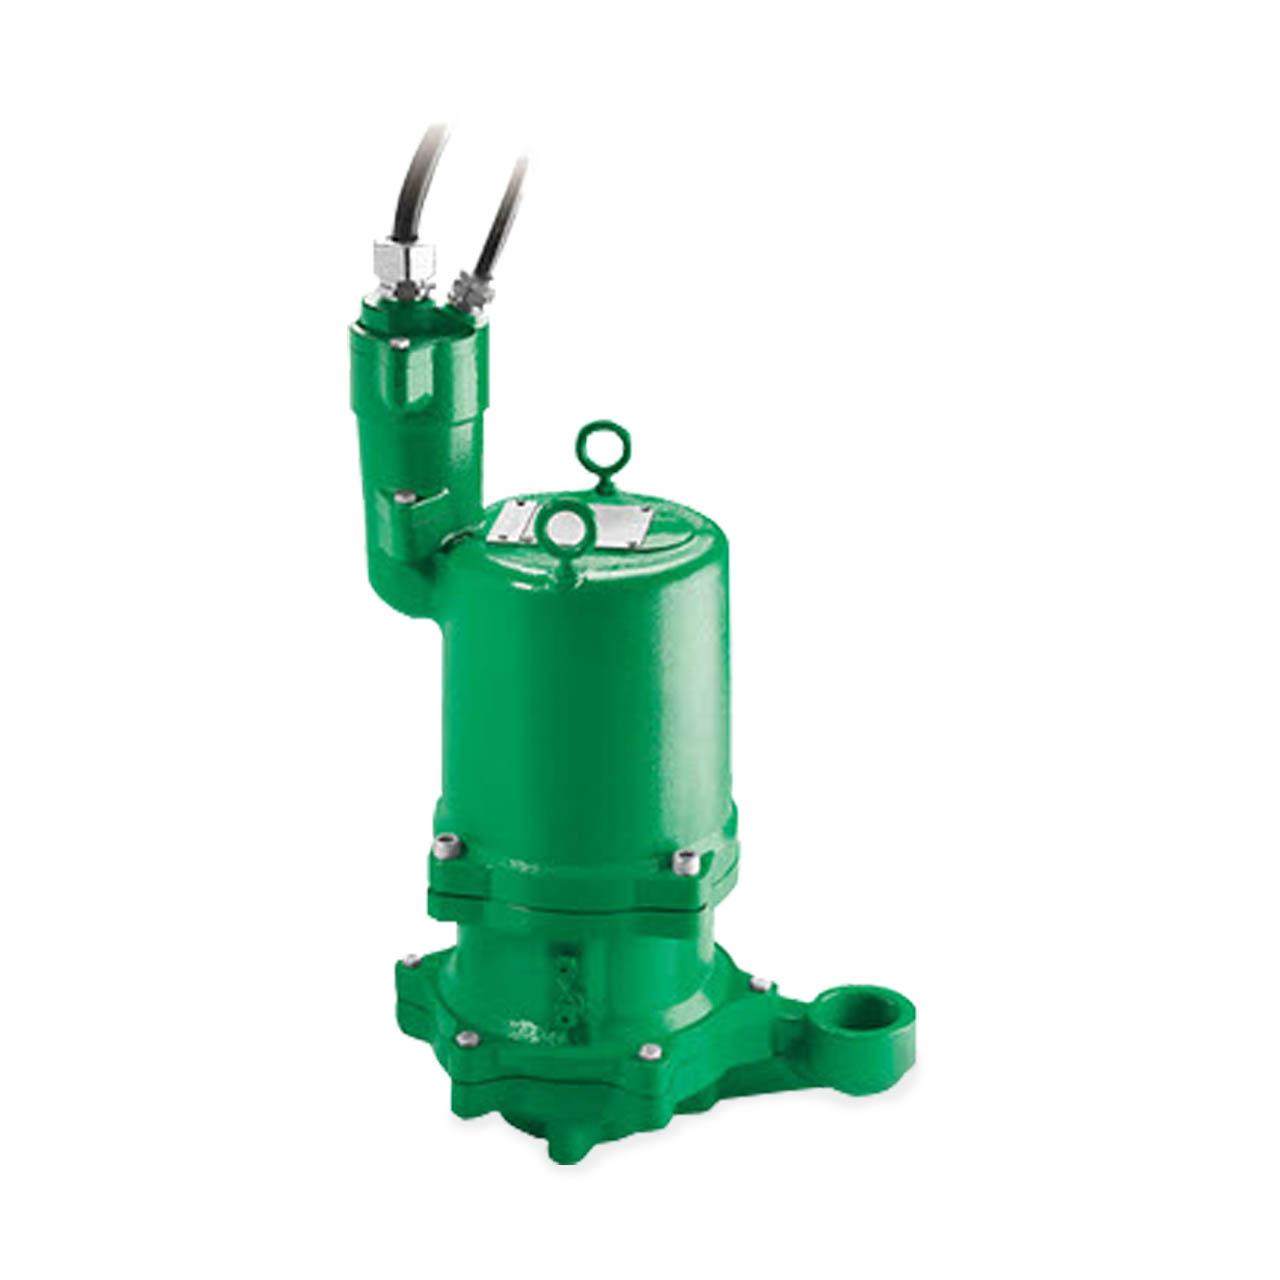 Hydromatic Pump Hydromatic Hpghx300cd Hazardous